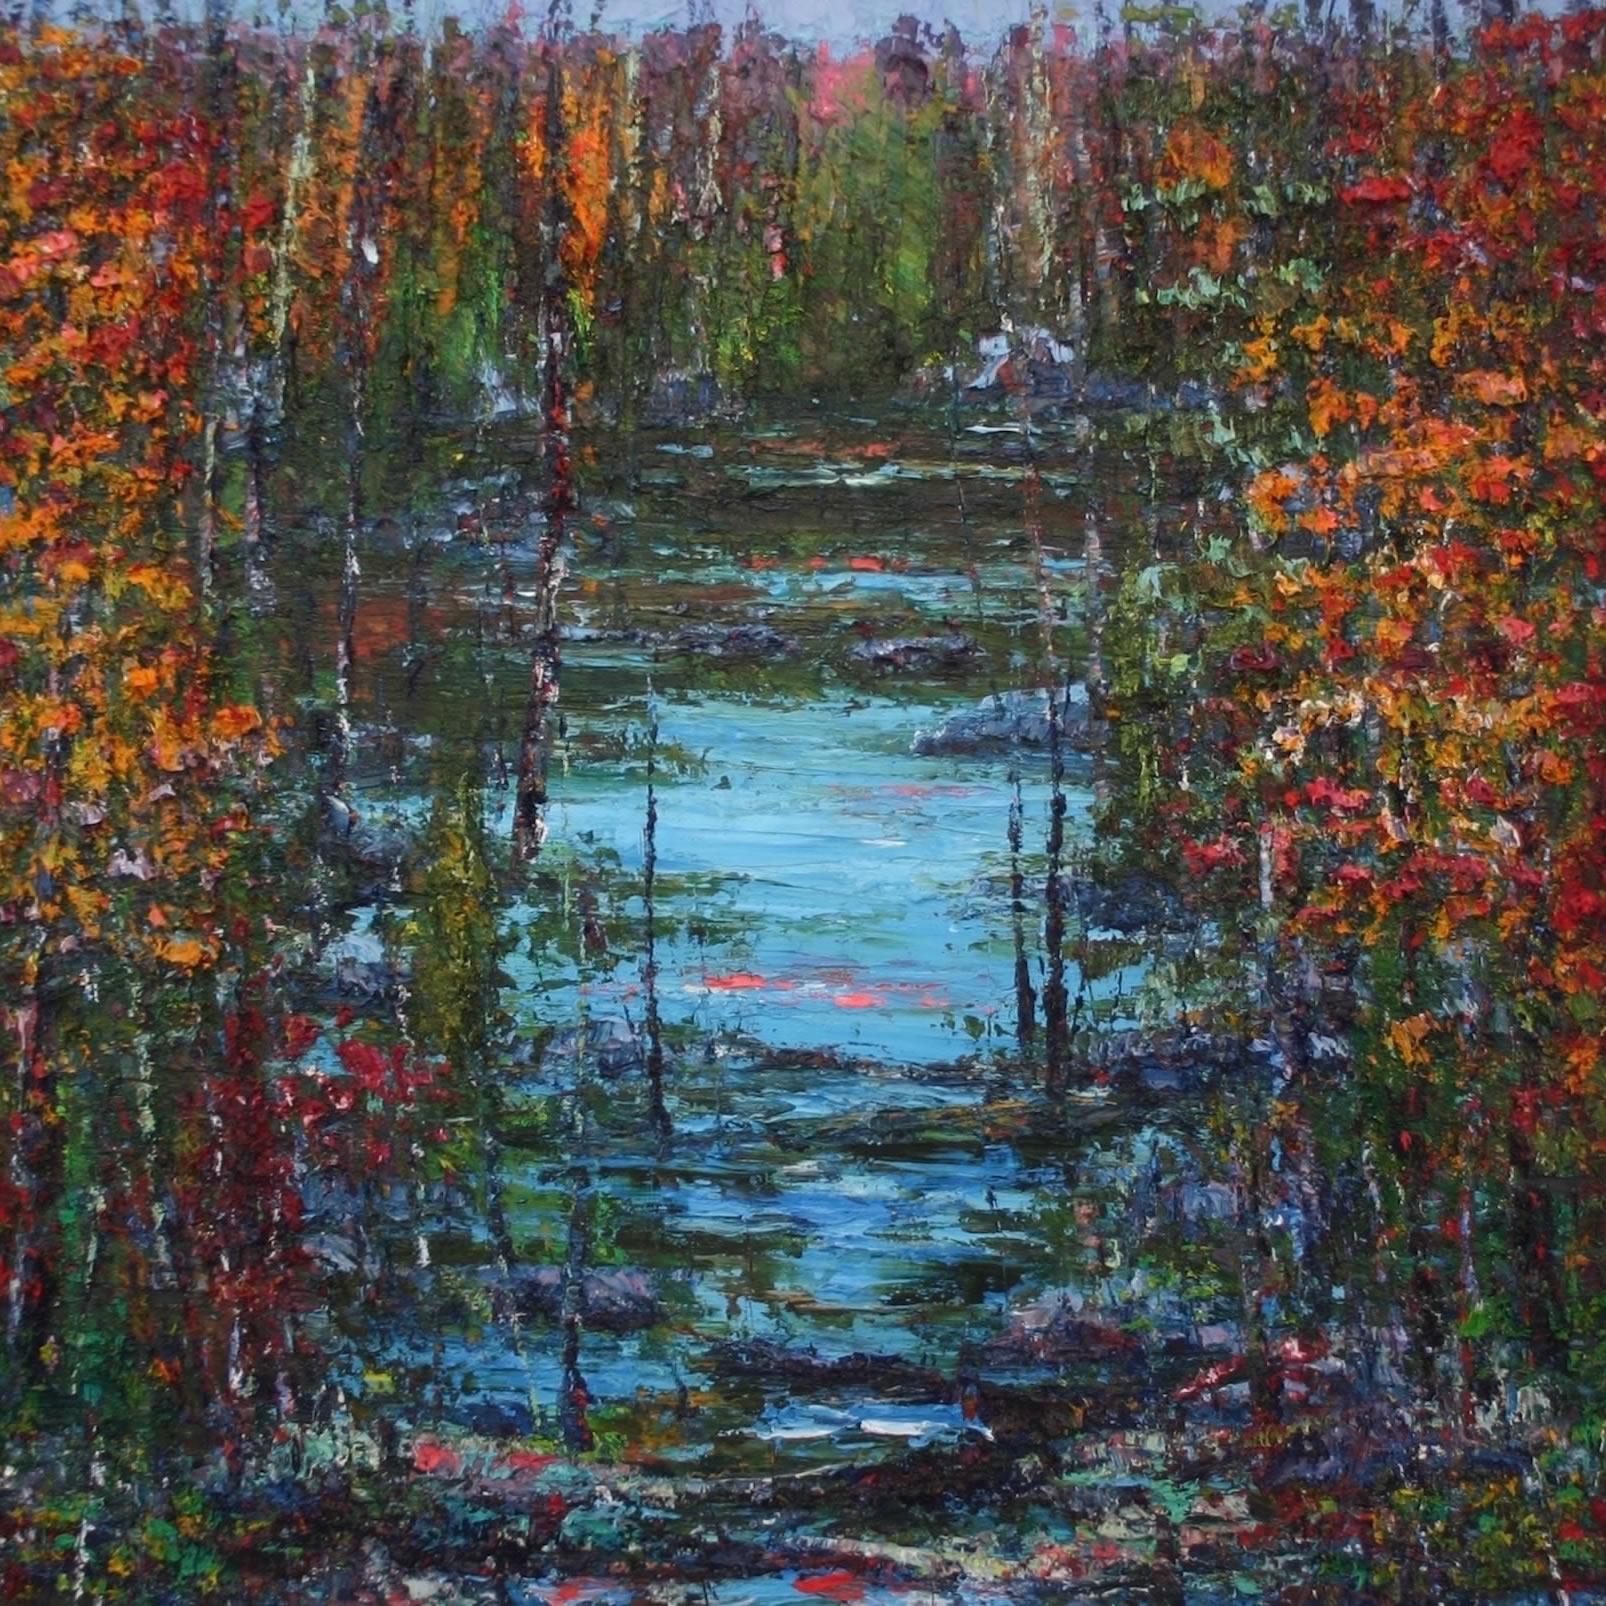 John-Barkley-Autumn-Highlights-2016-Online-Art-Galleries